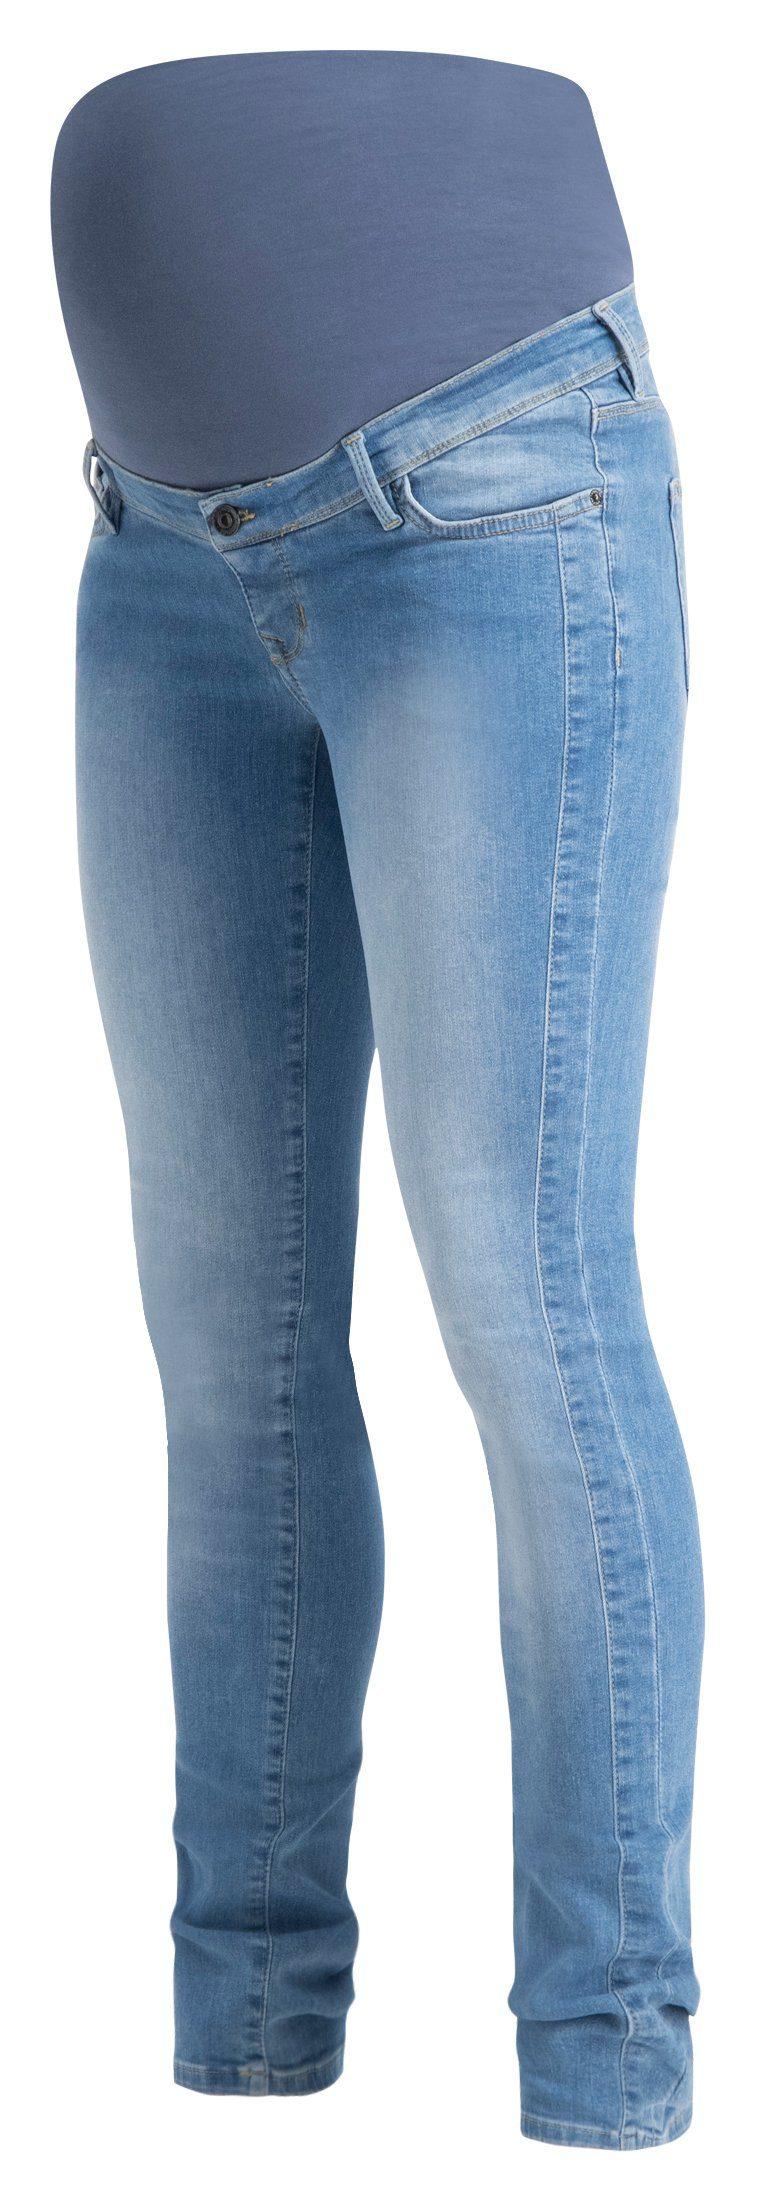 Noppies Skinny Jeans Avi Aged Blue Nu Online Bestellen - Geweldige Prijs